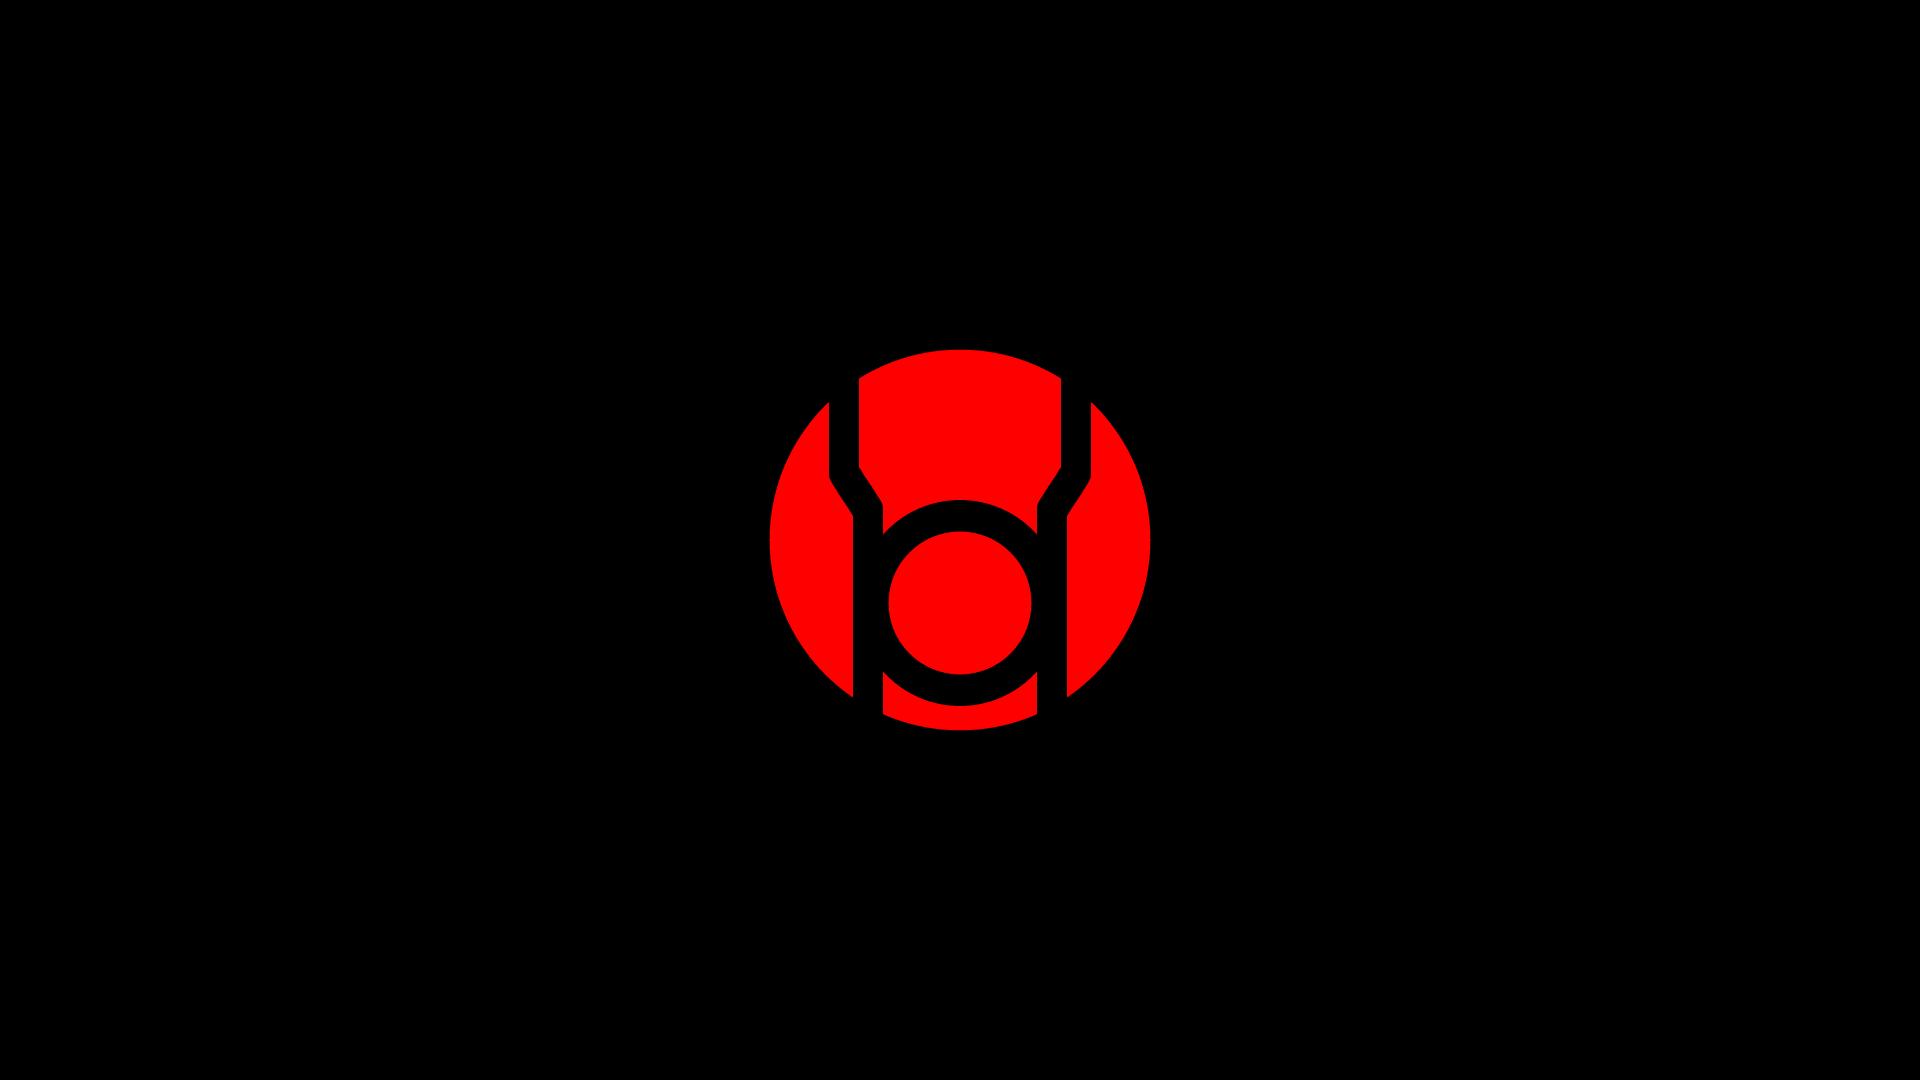 Red Lantern Logo Logodix